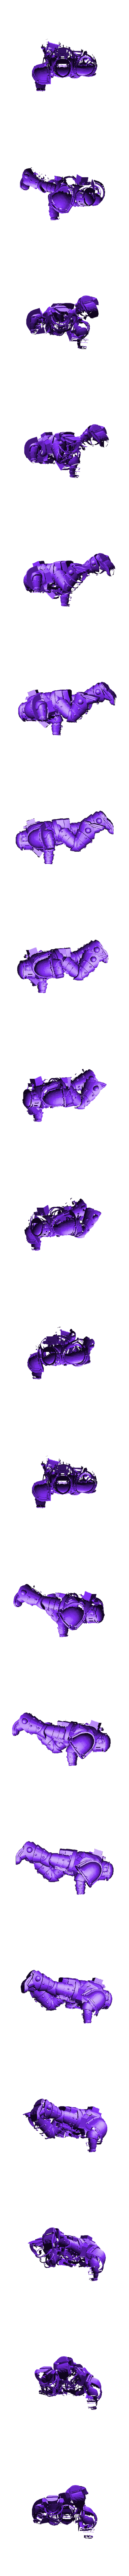 Marine_3_Split.stl Download free STL file Assault Marine Builder Berserker, Tzaangors, Blade Cabal • 3D printable template, Mazer